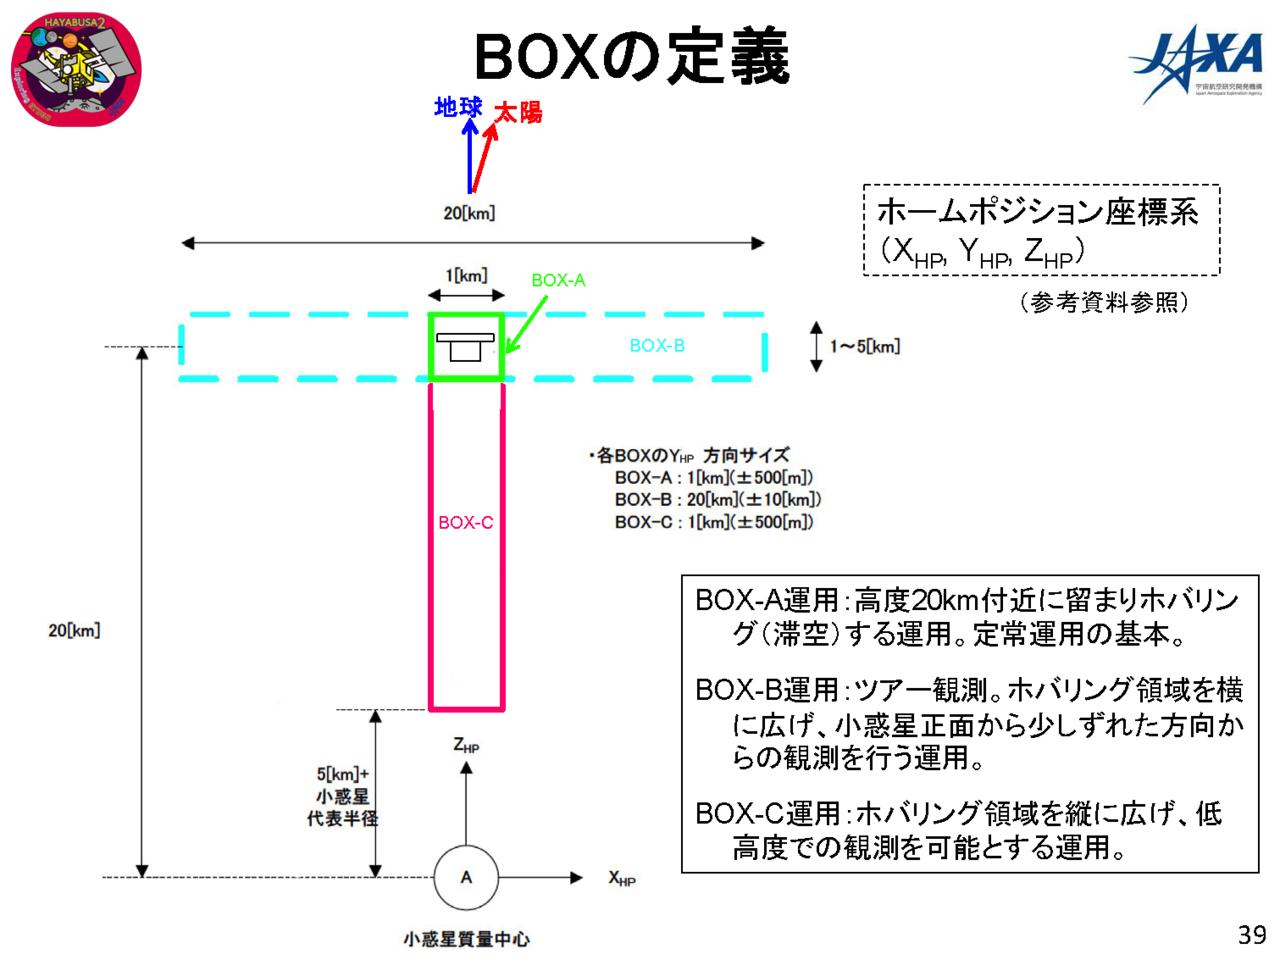 f:id:Imamura:20180802145959p:plain